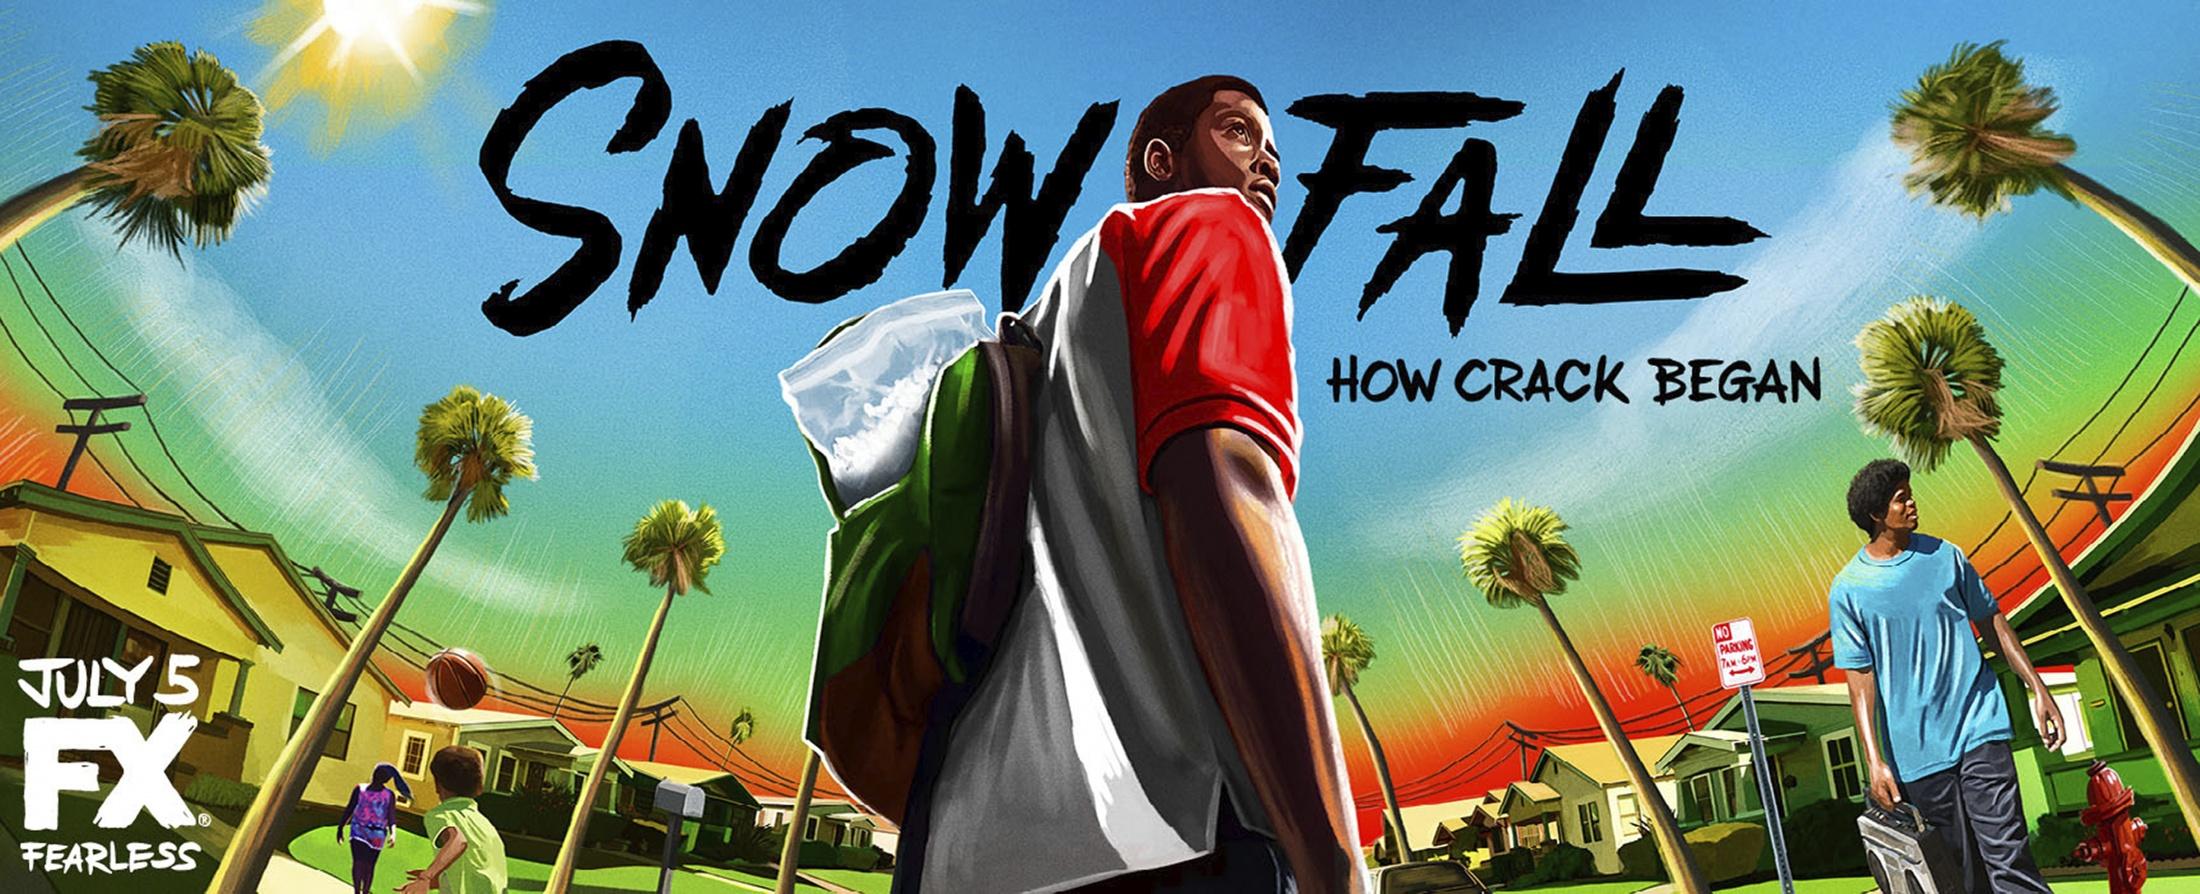 Thumbnail for Snowfall billboard (Franklin)